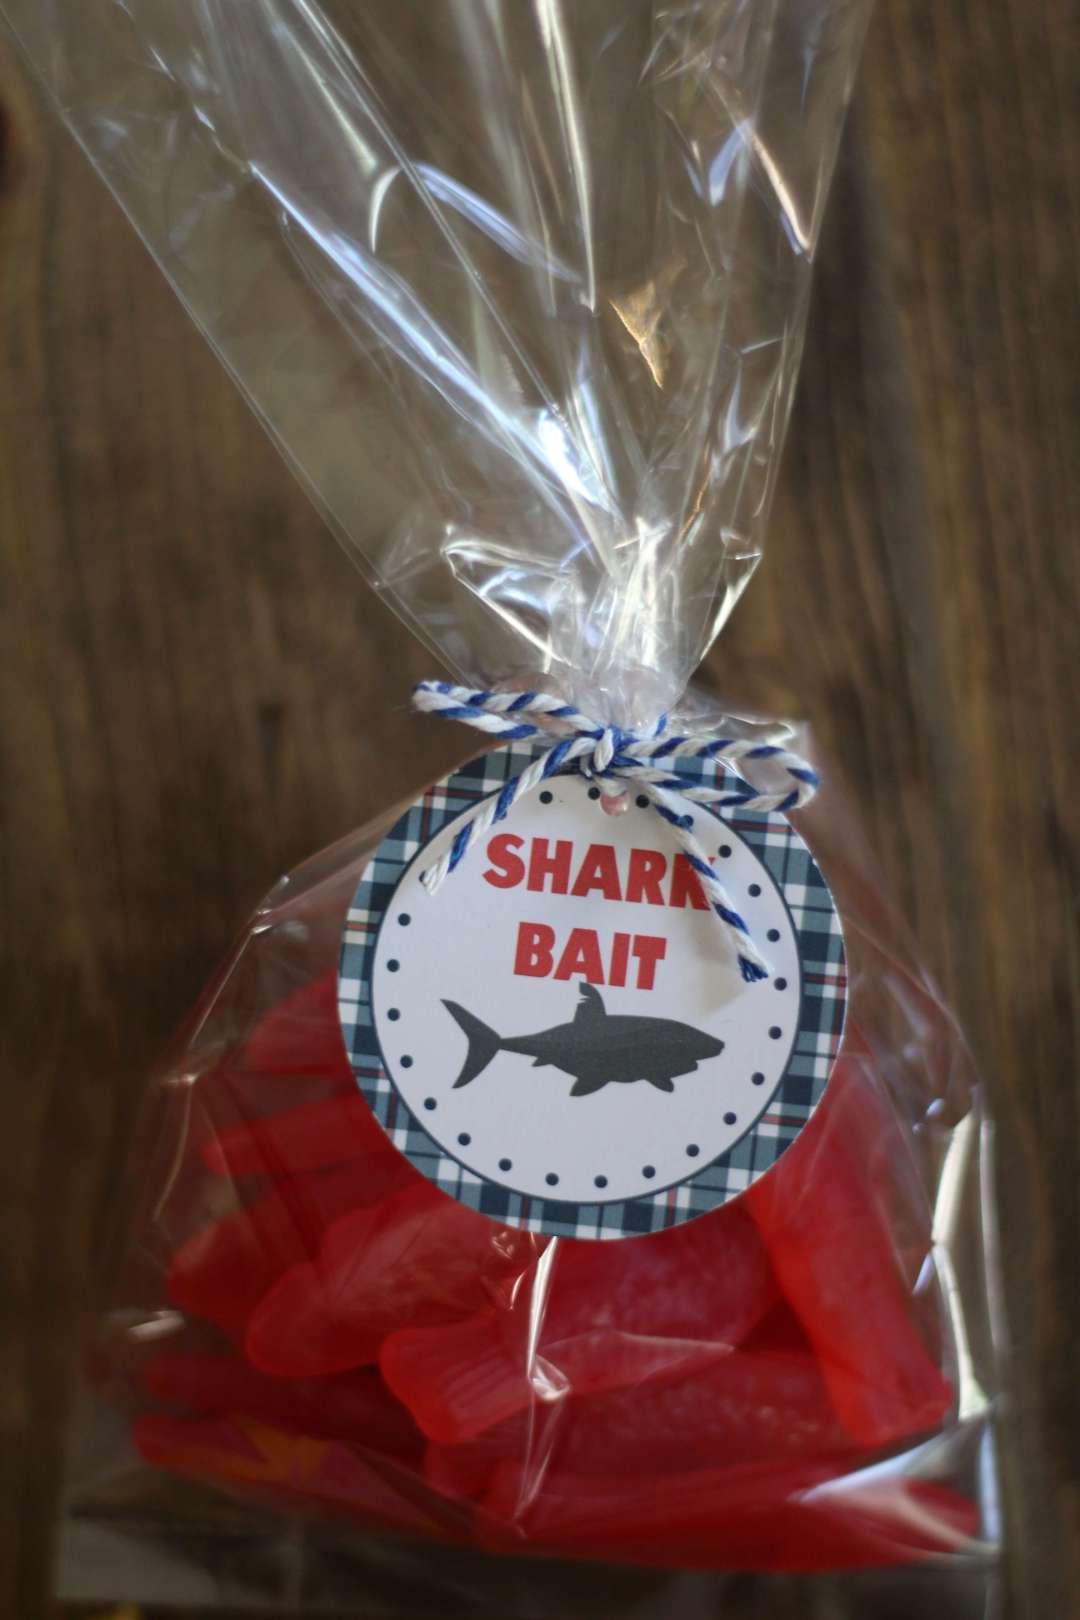 Shark Bait Free Printable Tags, Shark Week, Sharks, Free Printable, Freebies, Everyday Party Magazine